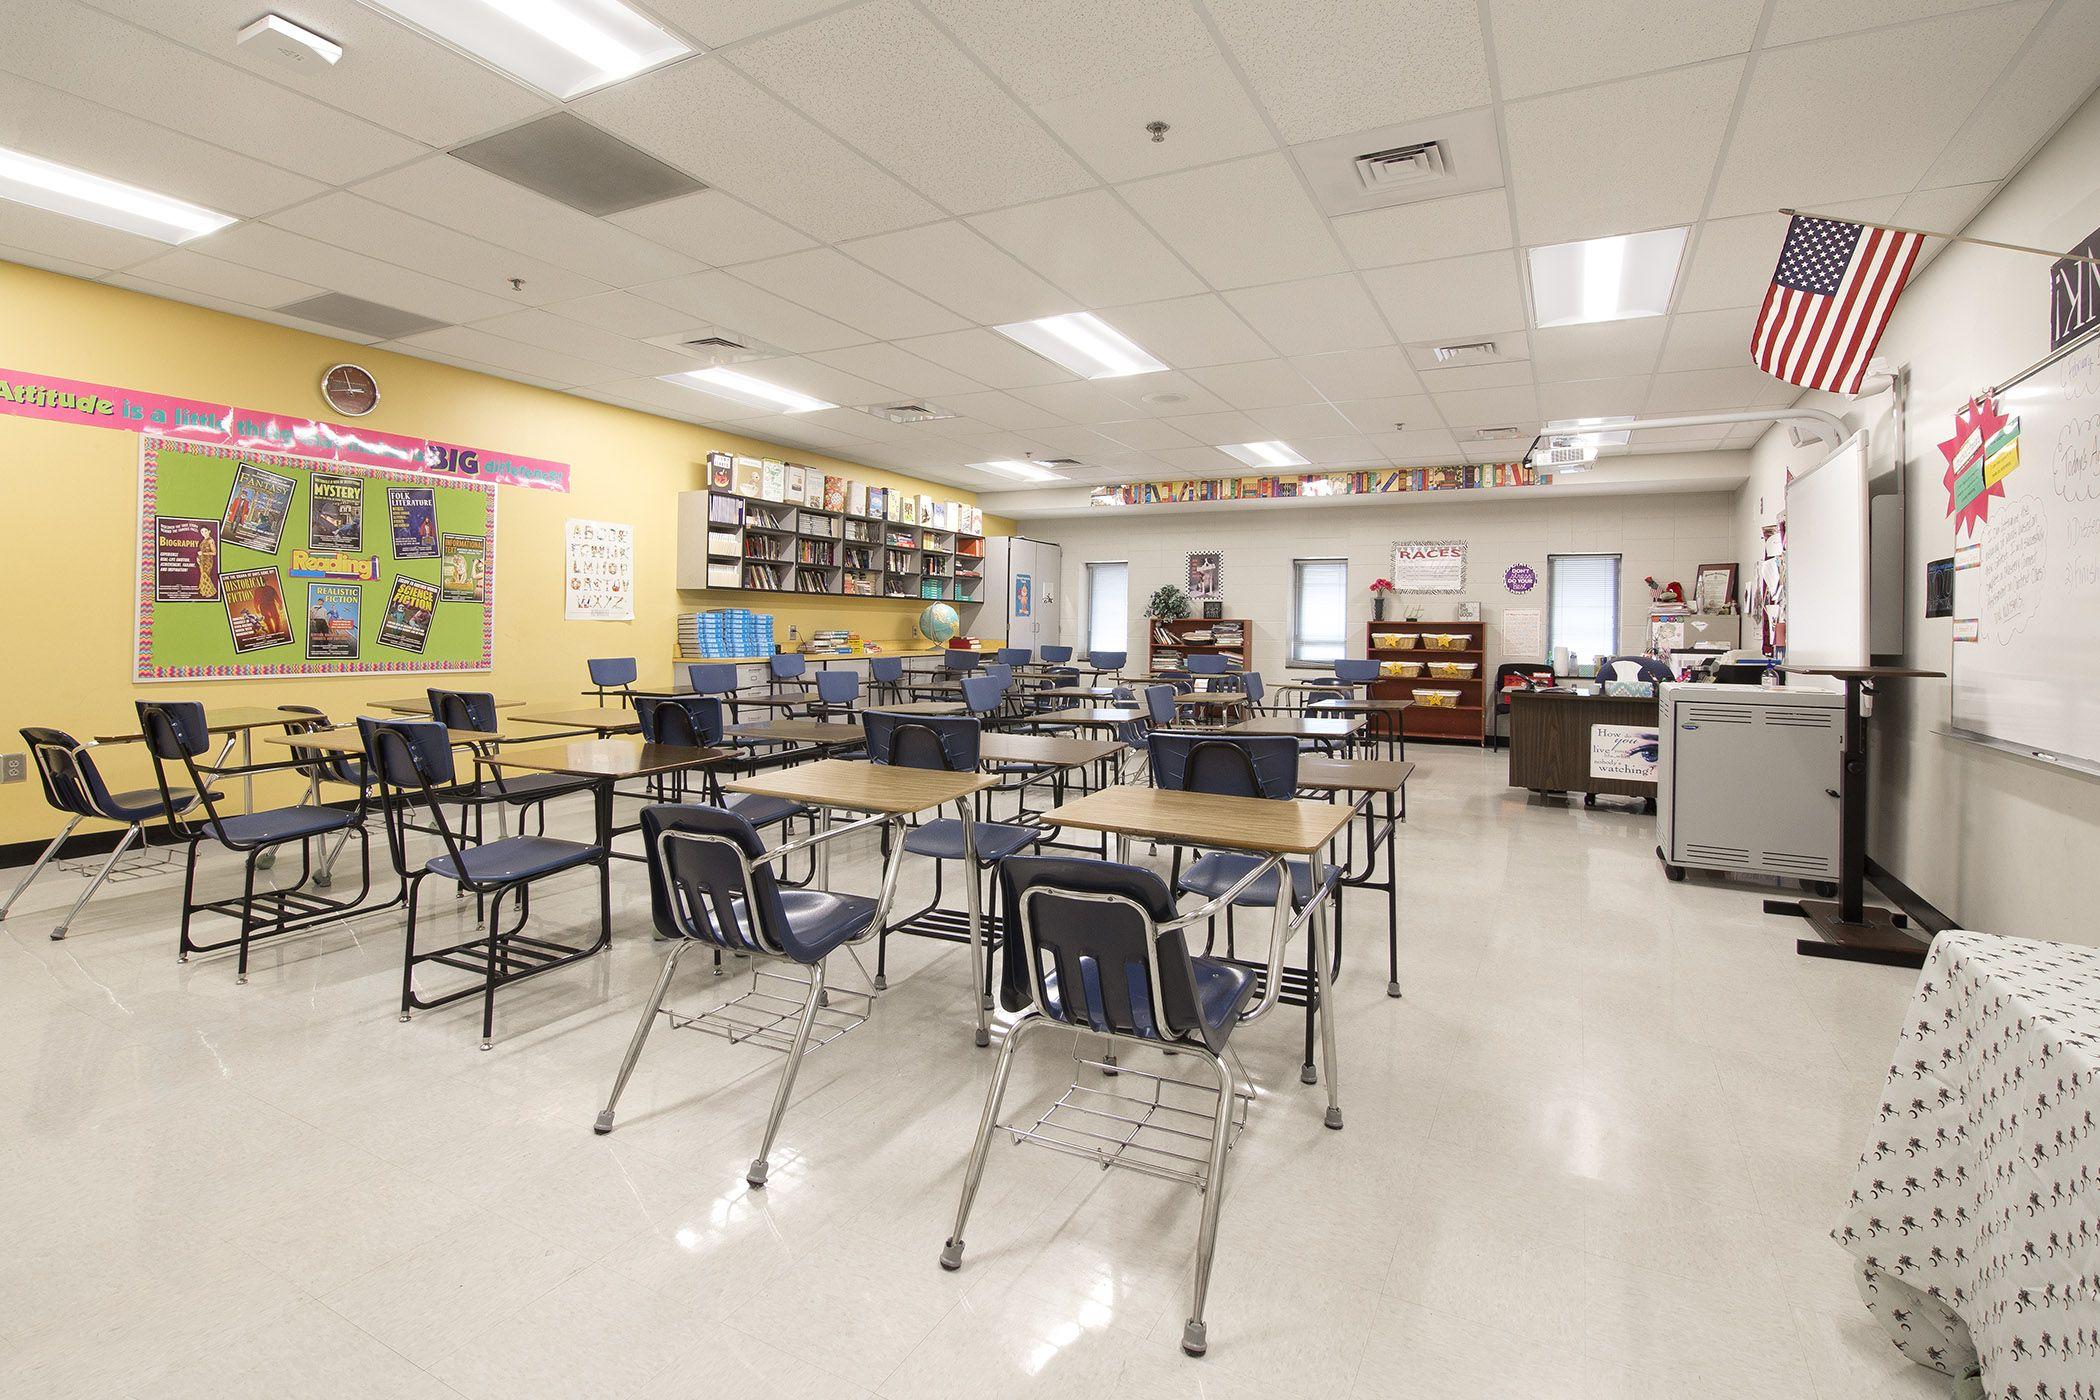 Environmentally Friendly Led Lights Qualify School Retrofit Design For Huge Energy Savings Rebate College Architecture Design Save Energy